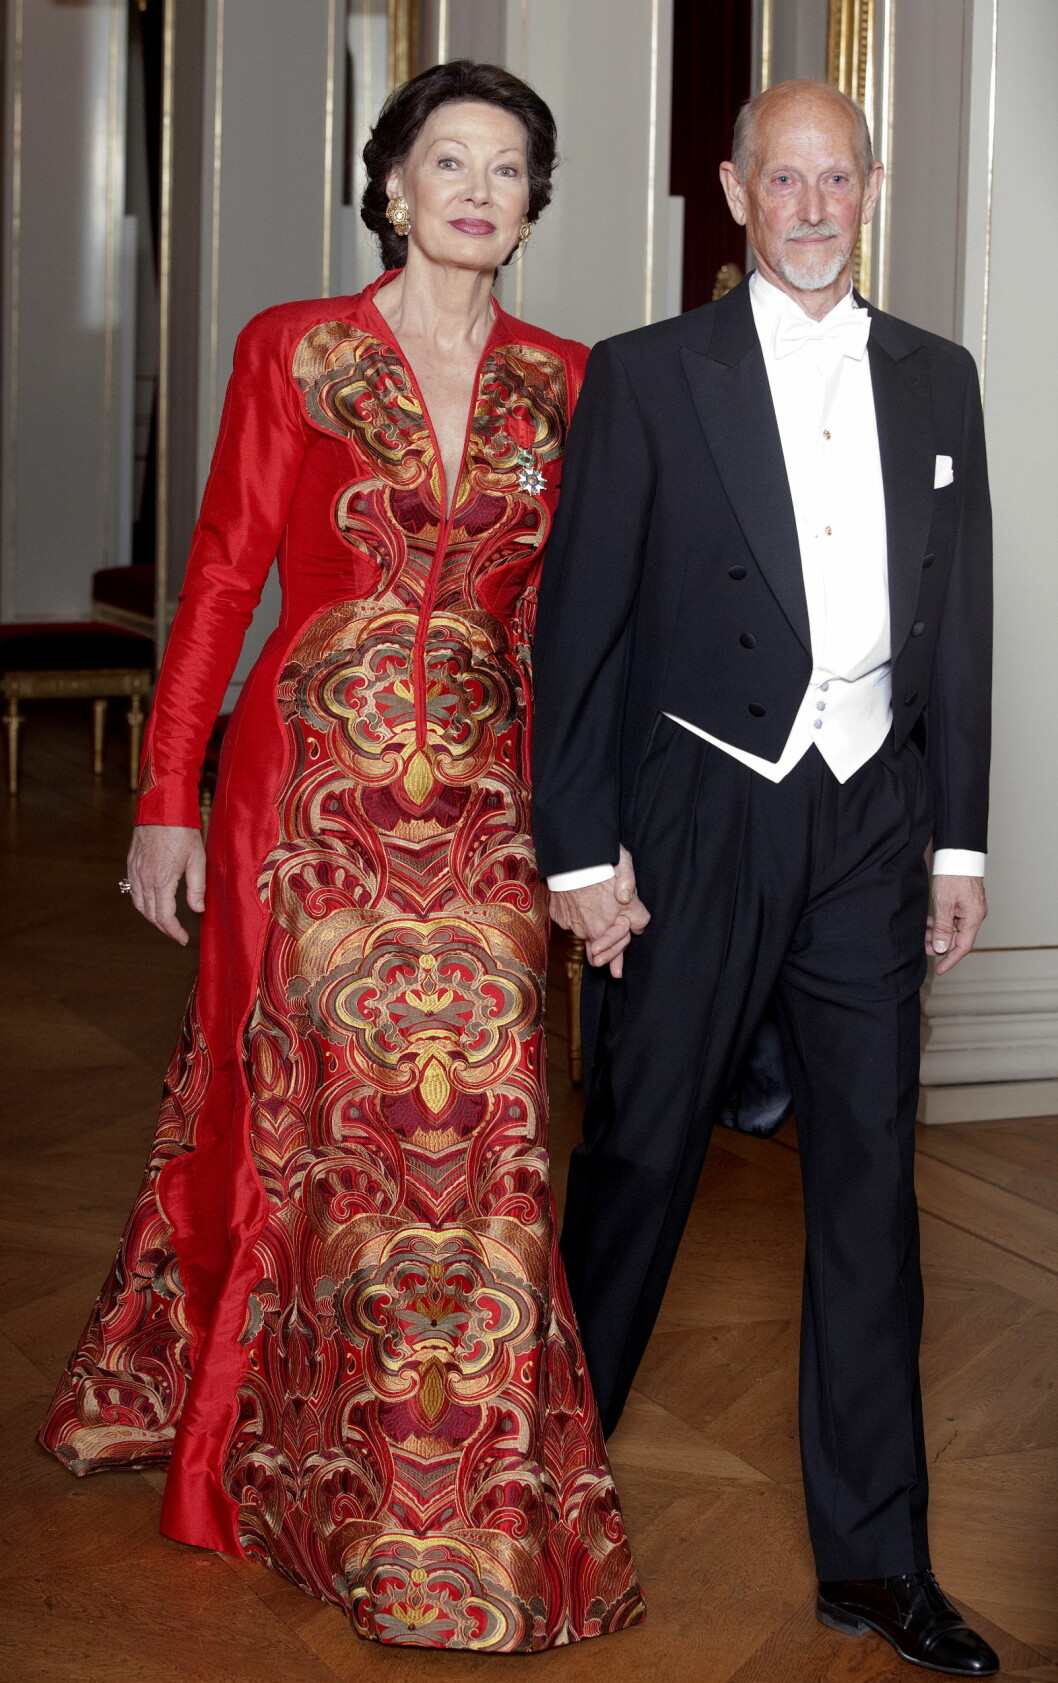 PROFILERT PAR: Flotte Åse Kleveland og Oddvar Bull Tuhus på vei til en gallamiddag på Slottet i 2011. De to har vært sentrale profiler i norsk kulturliv gjennom flere tiår.  Foto: NTB scanpix